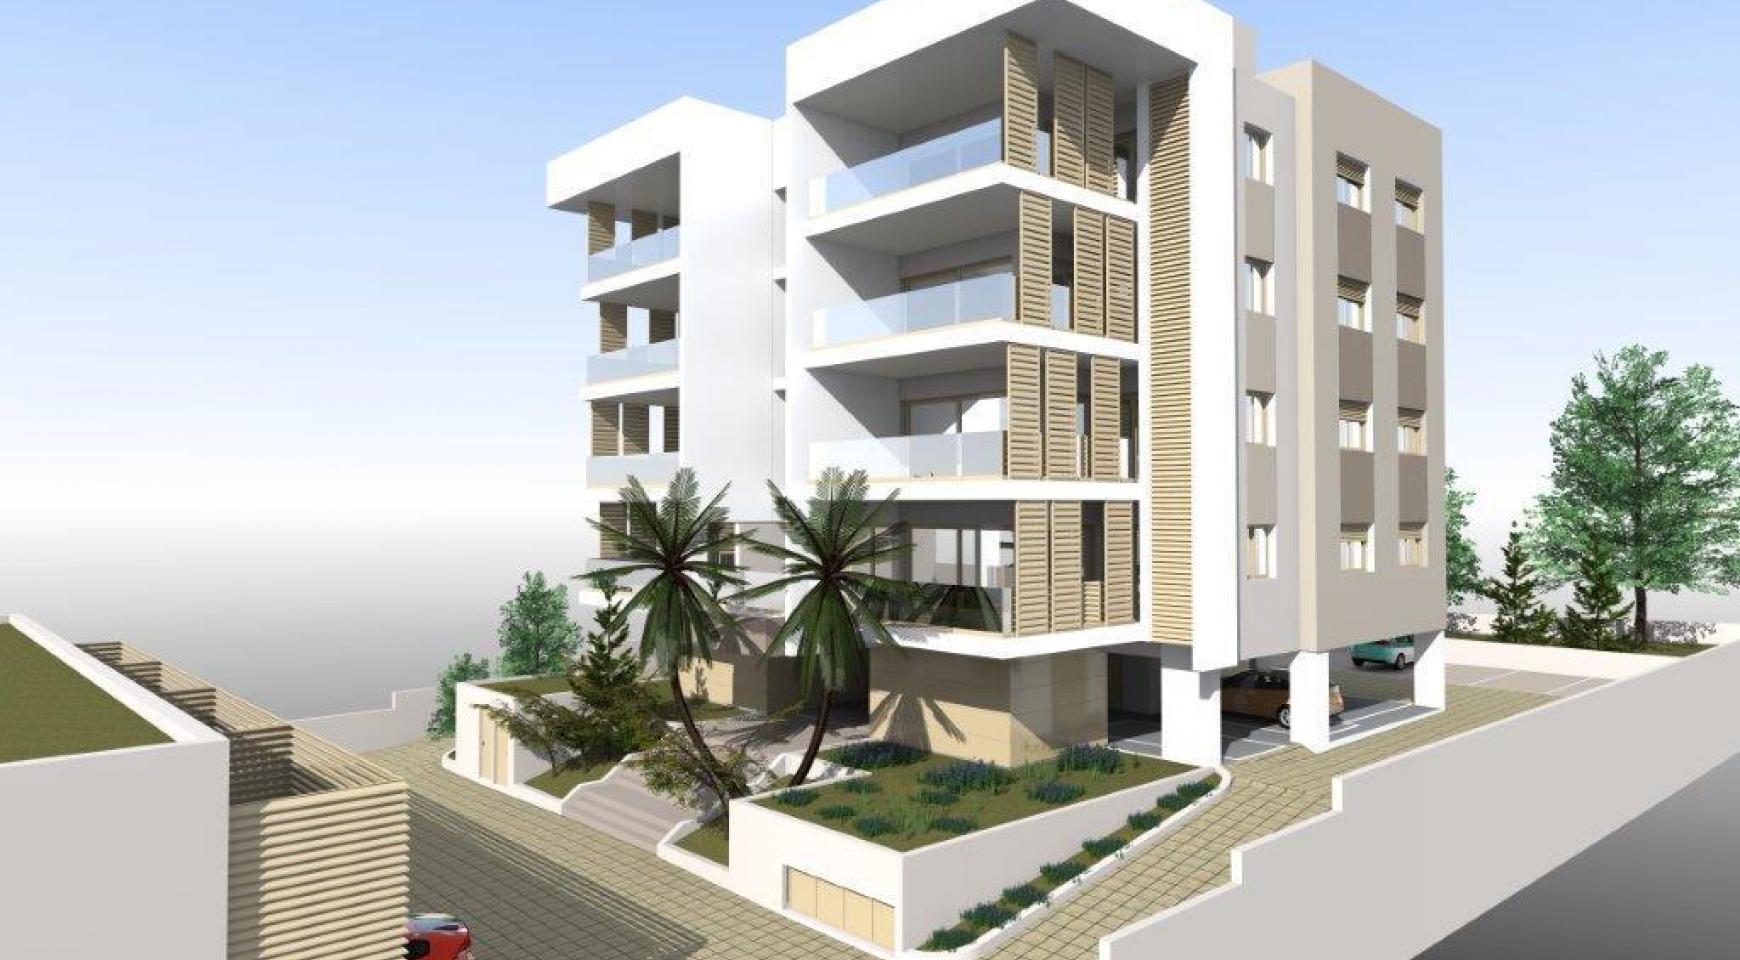 New Spacious 3 Bedroom Apartment  near the Sea - 7